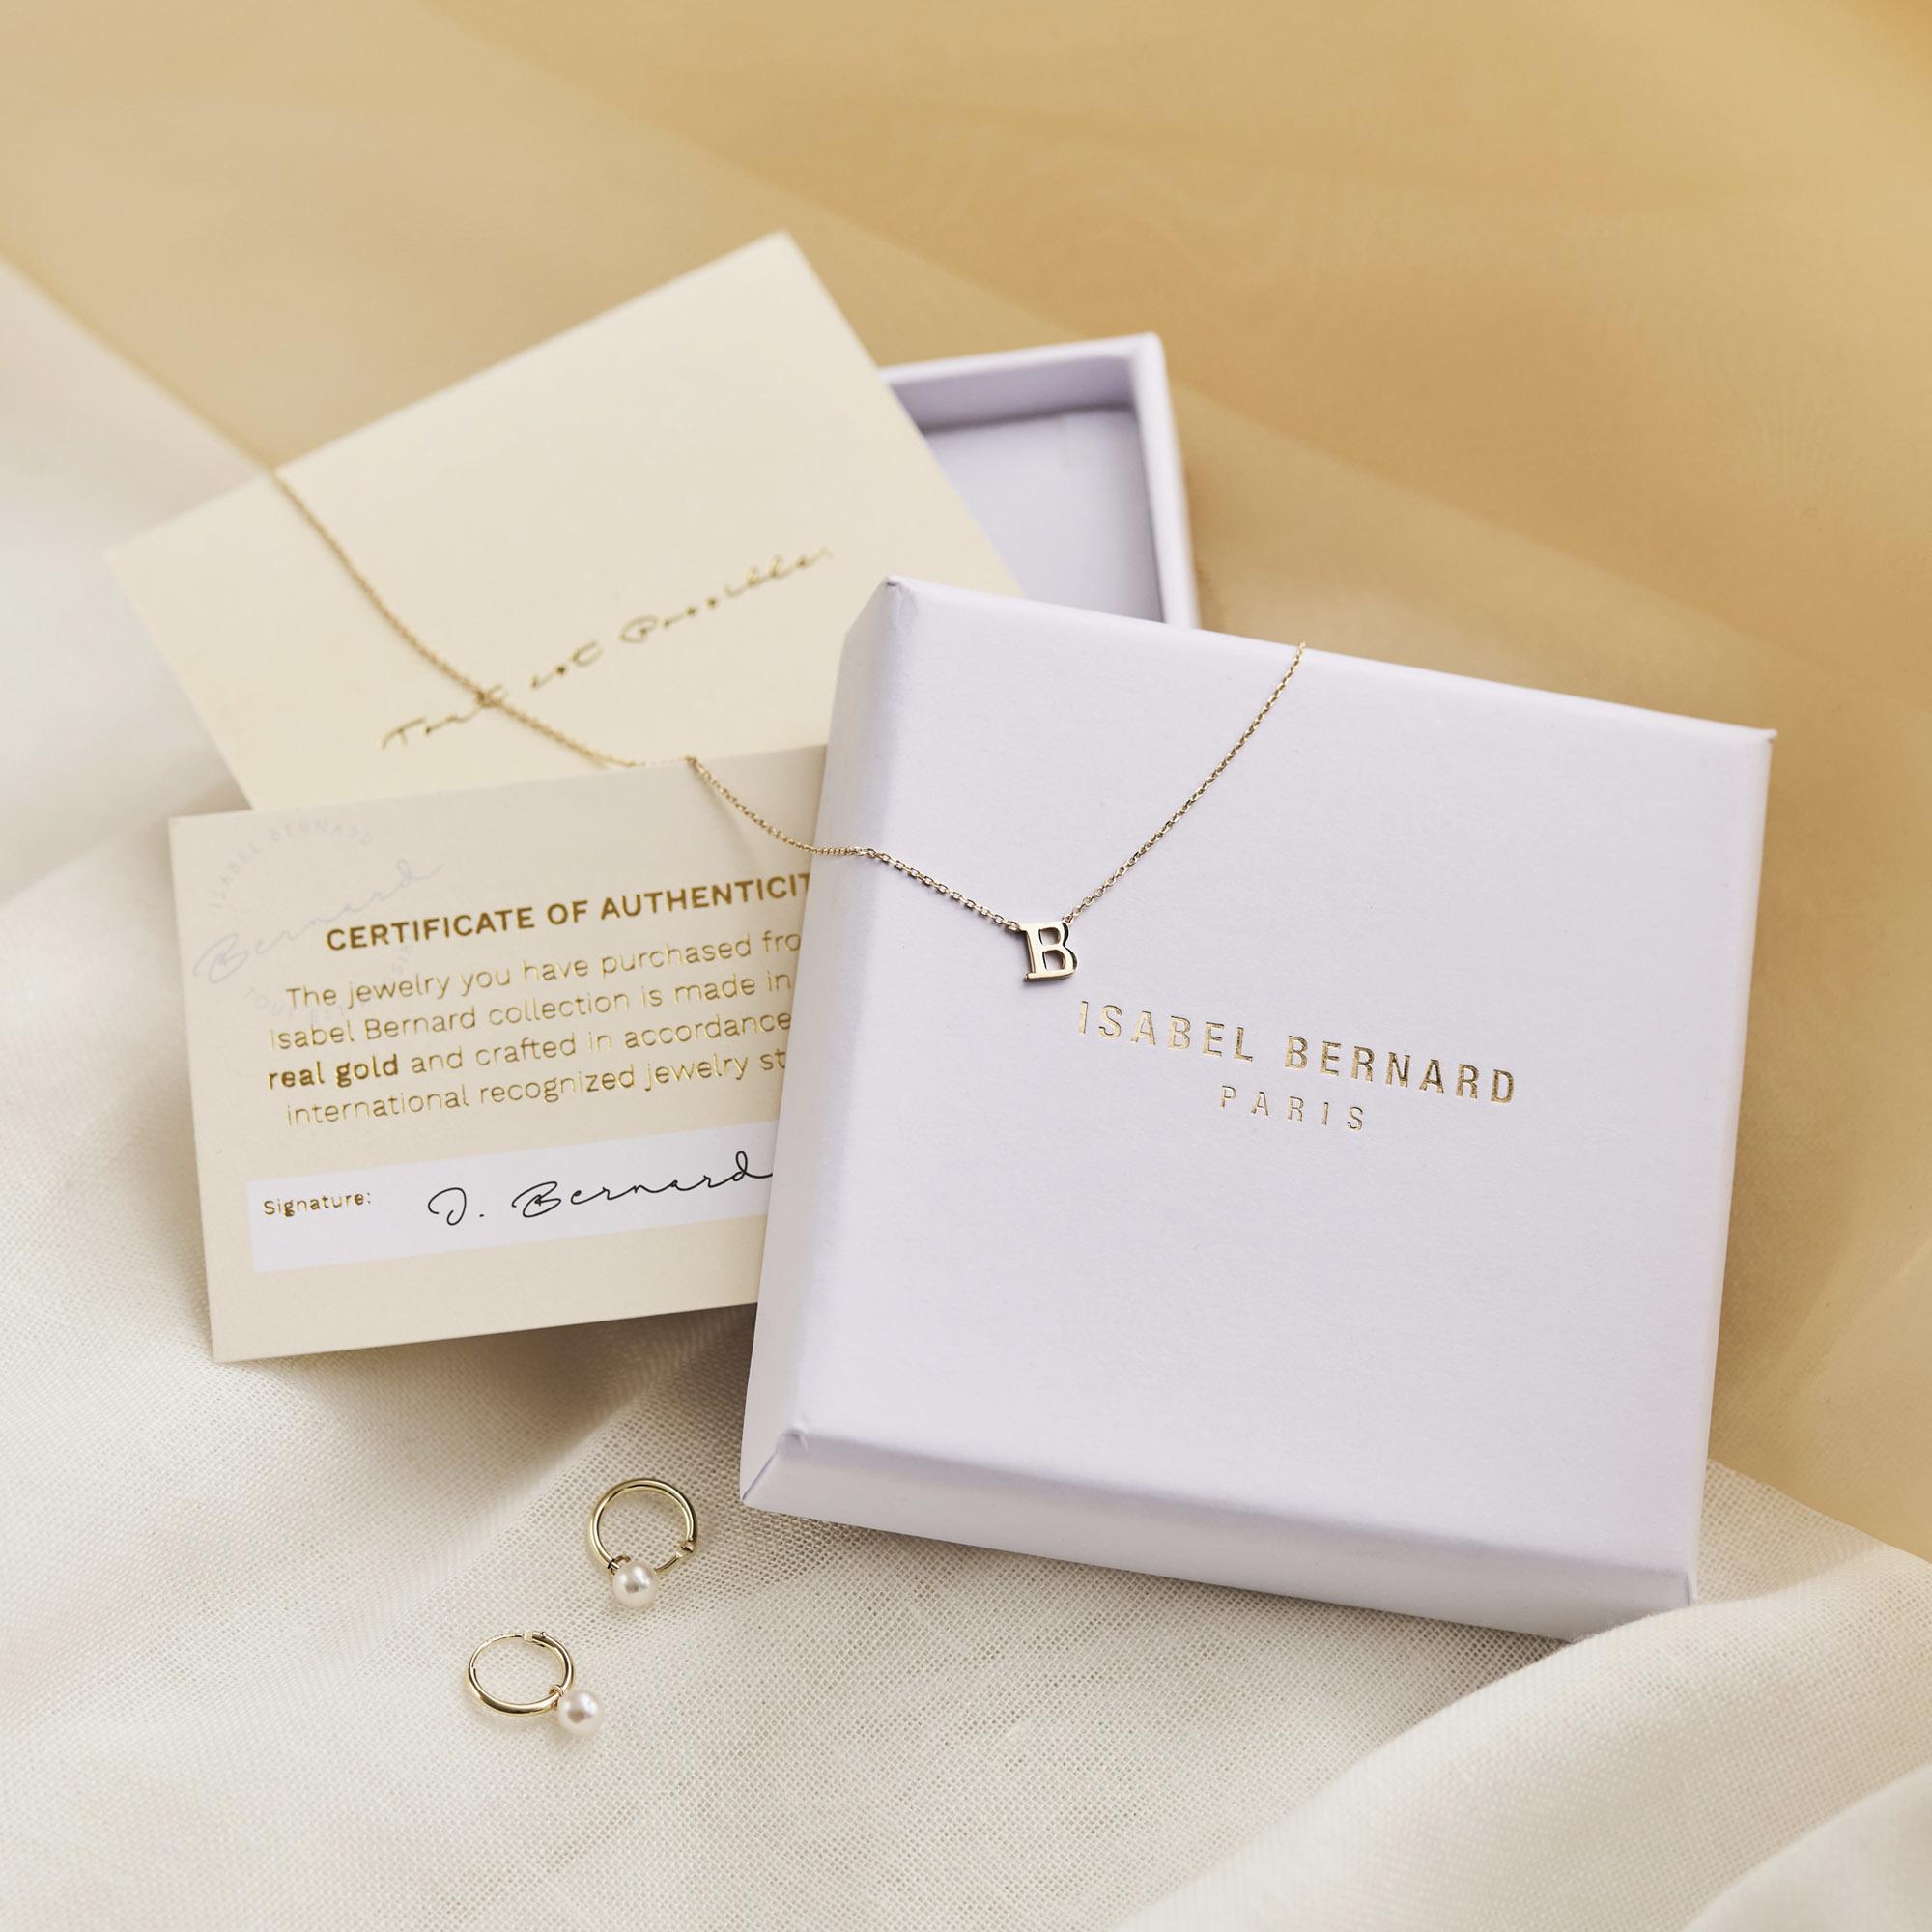 Isabel Bernard Le Marais Rachel 14 karat gold initial bracelet with letter